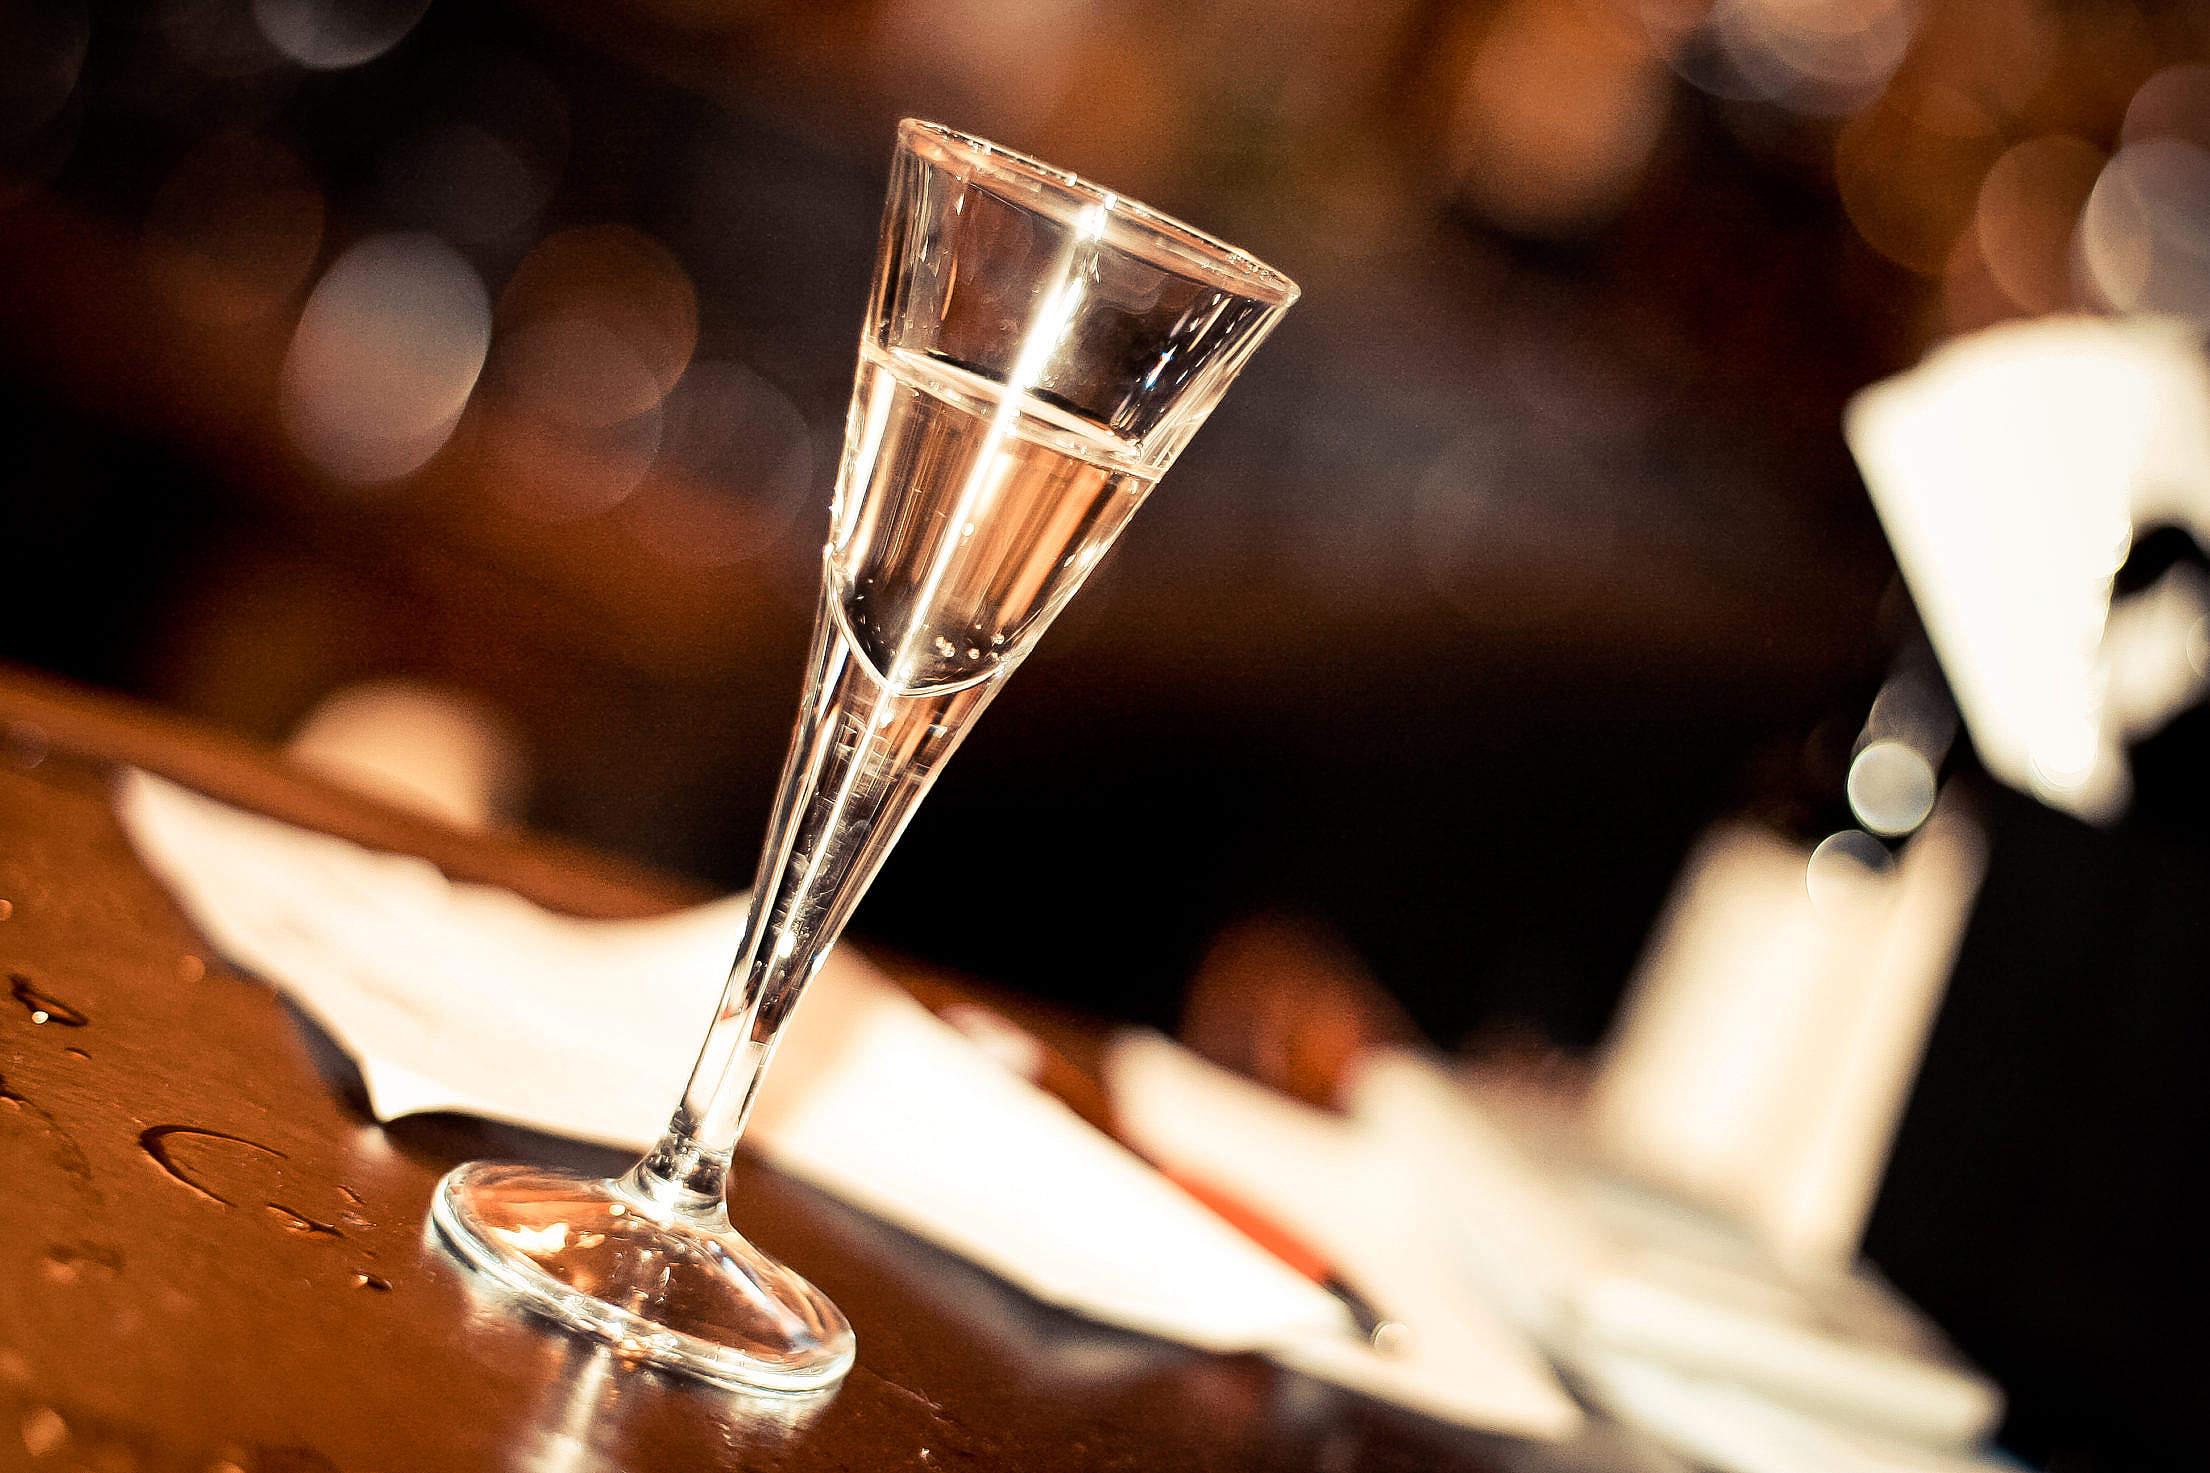 Download Small Liquor Shot Glass Free Stock Photo